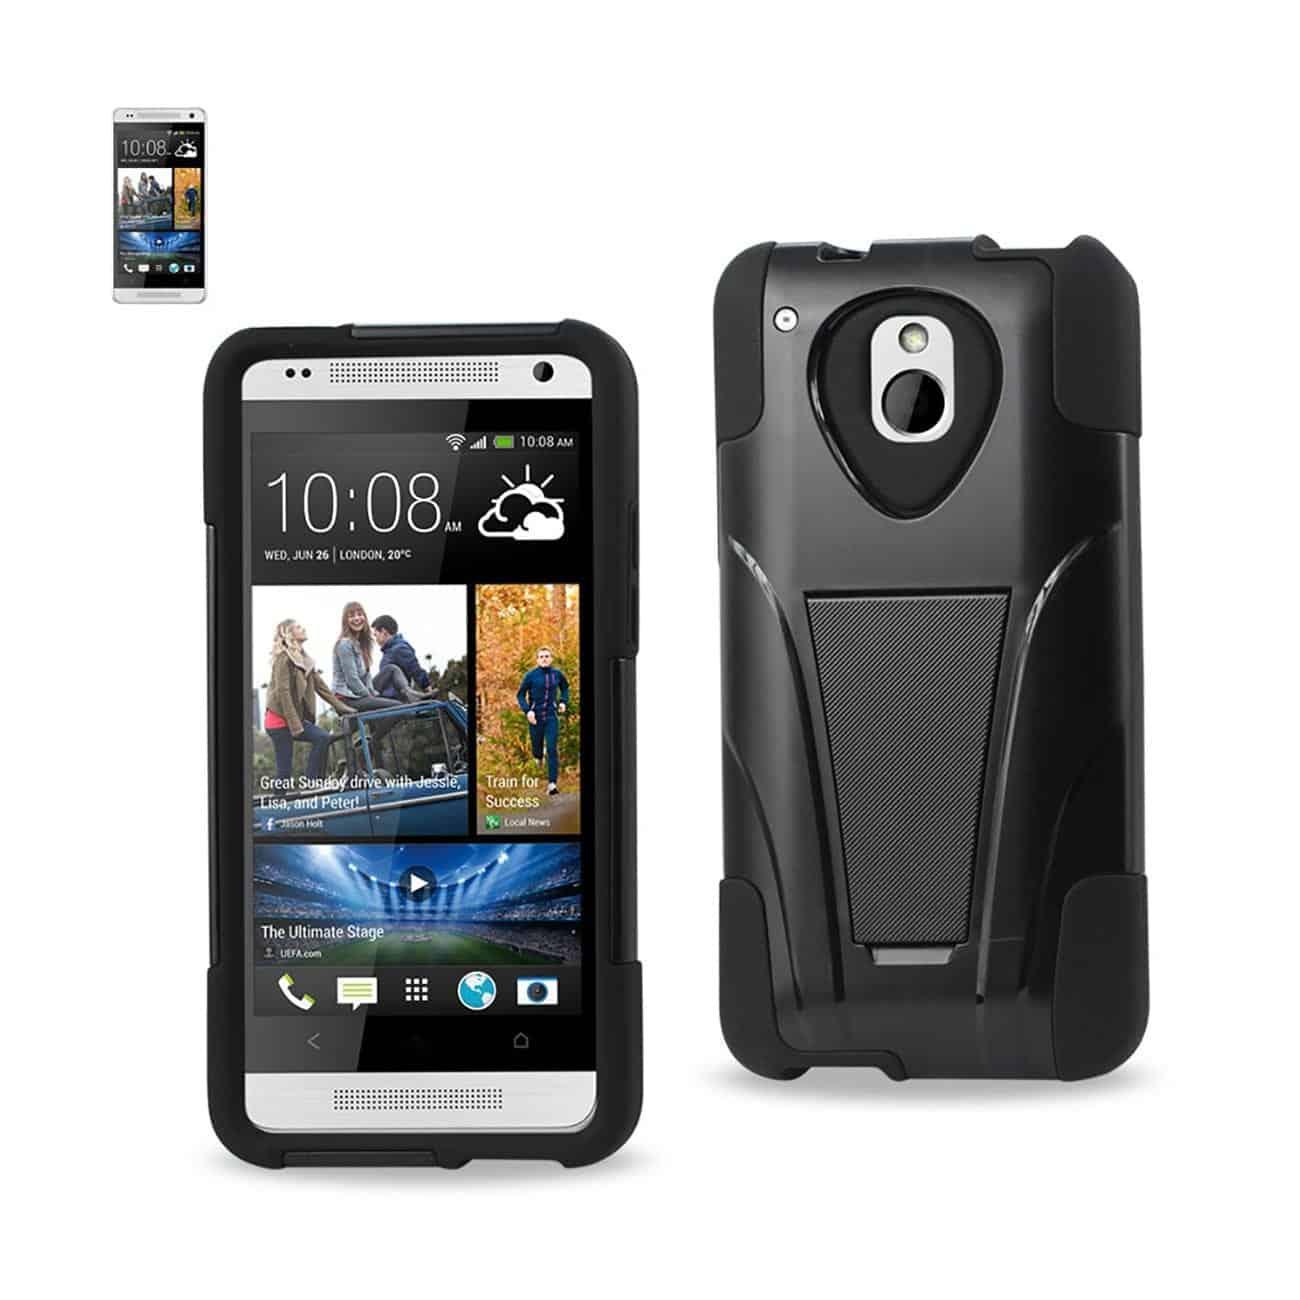 HTC ONE MINI M4 HYBRID HEAVY DUTY CASE WITH KICKSTAND IN BLACK